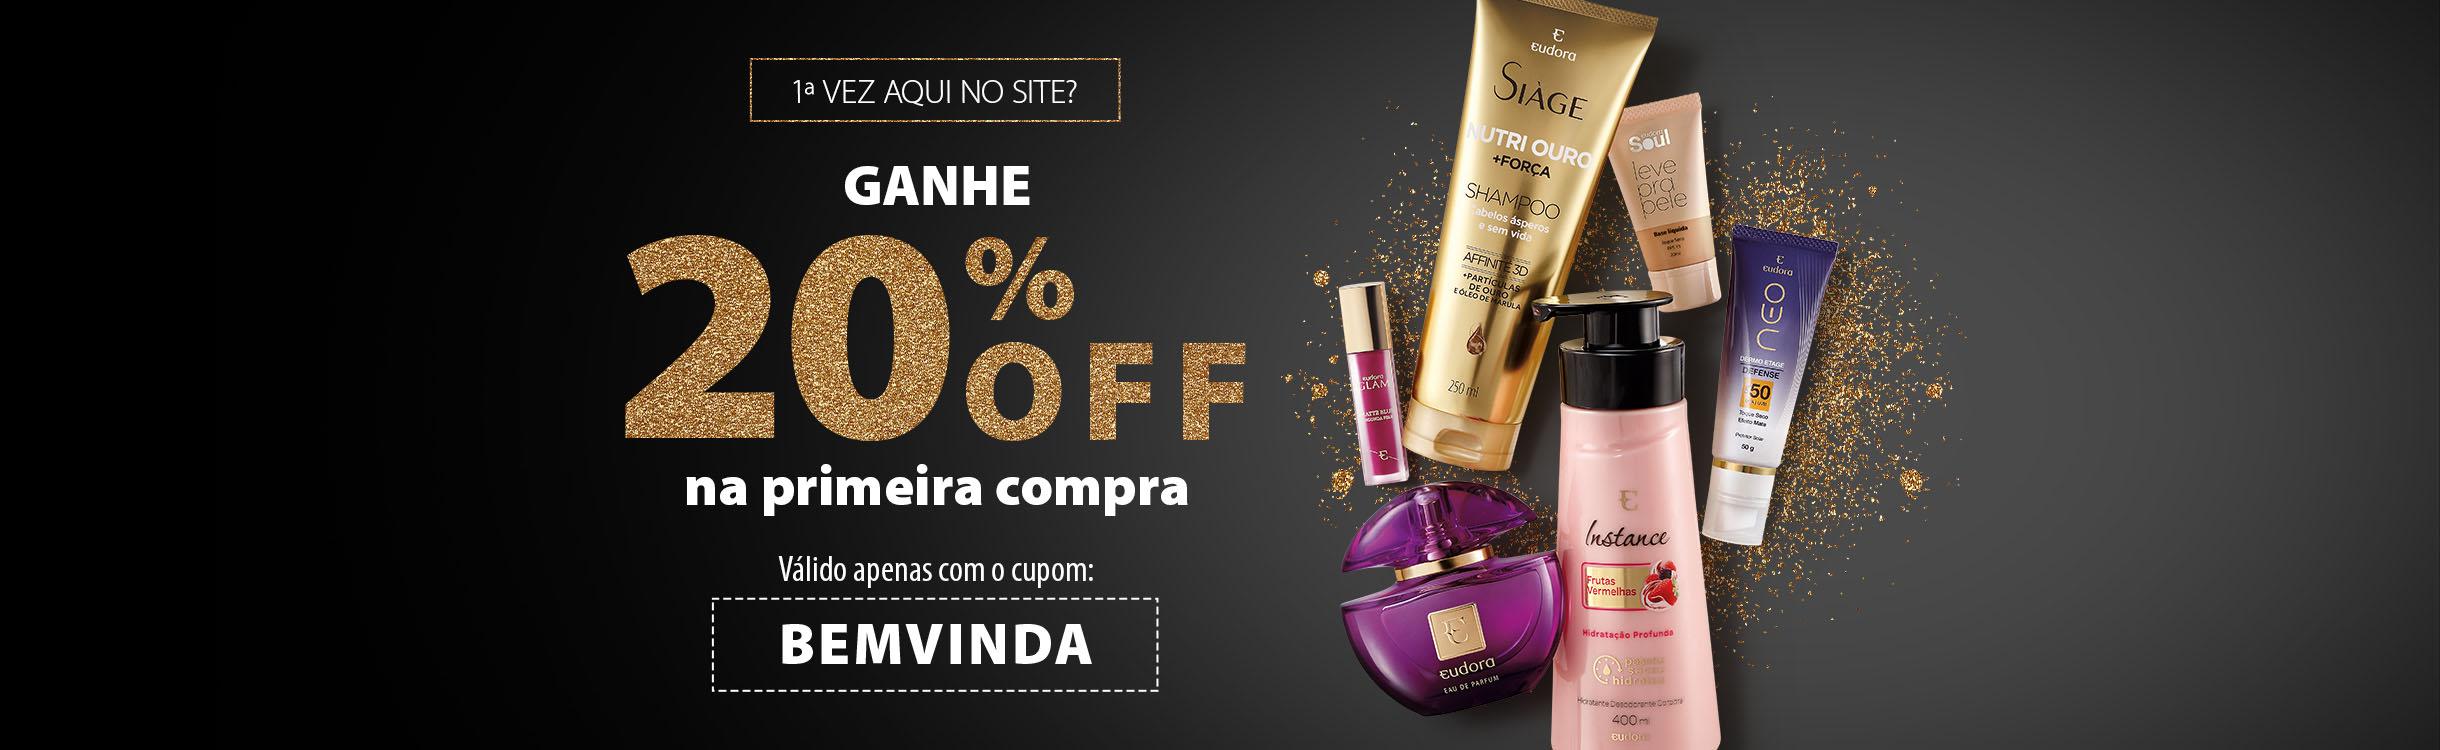 20% OFF Primeira Compra